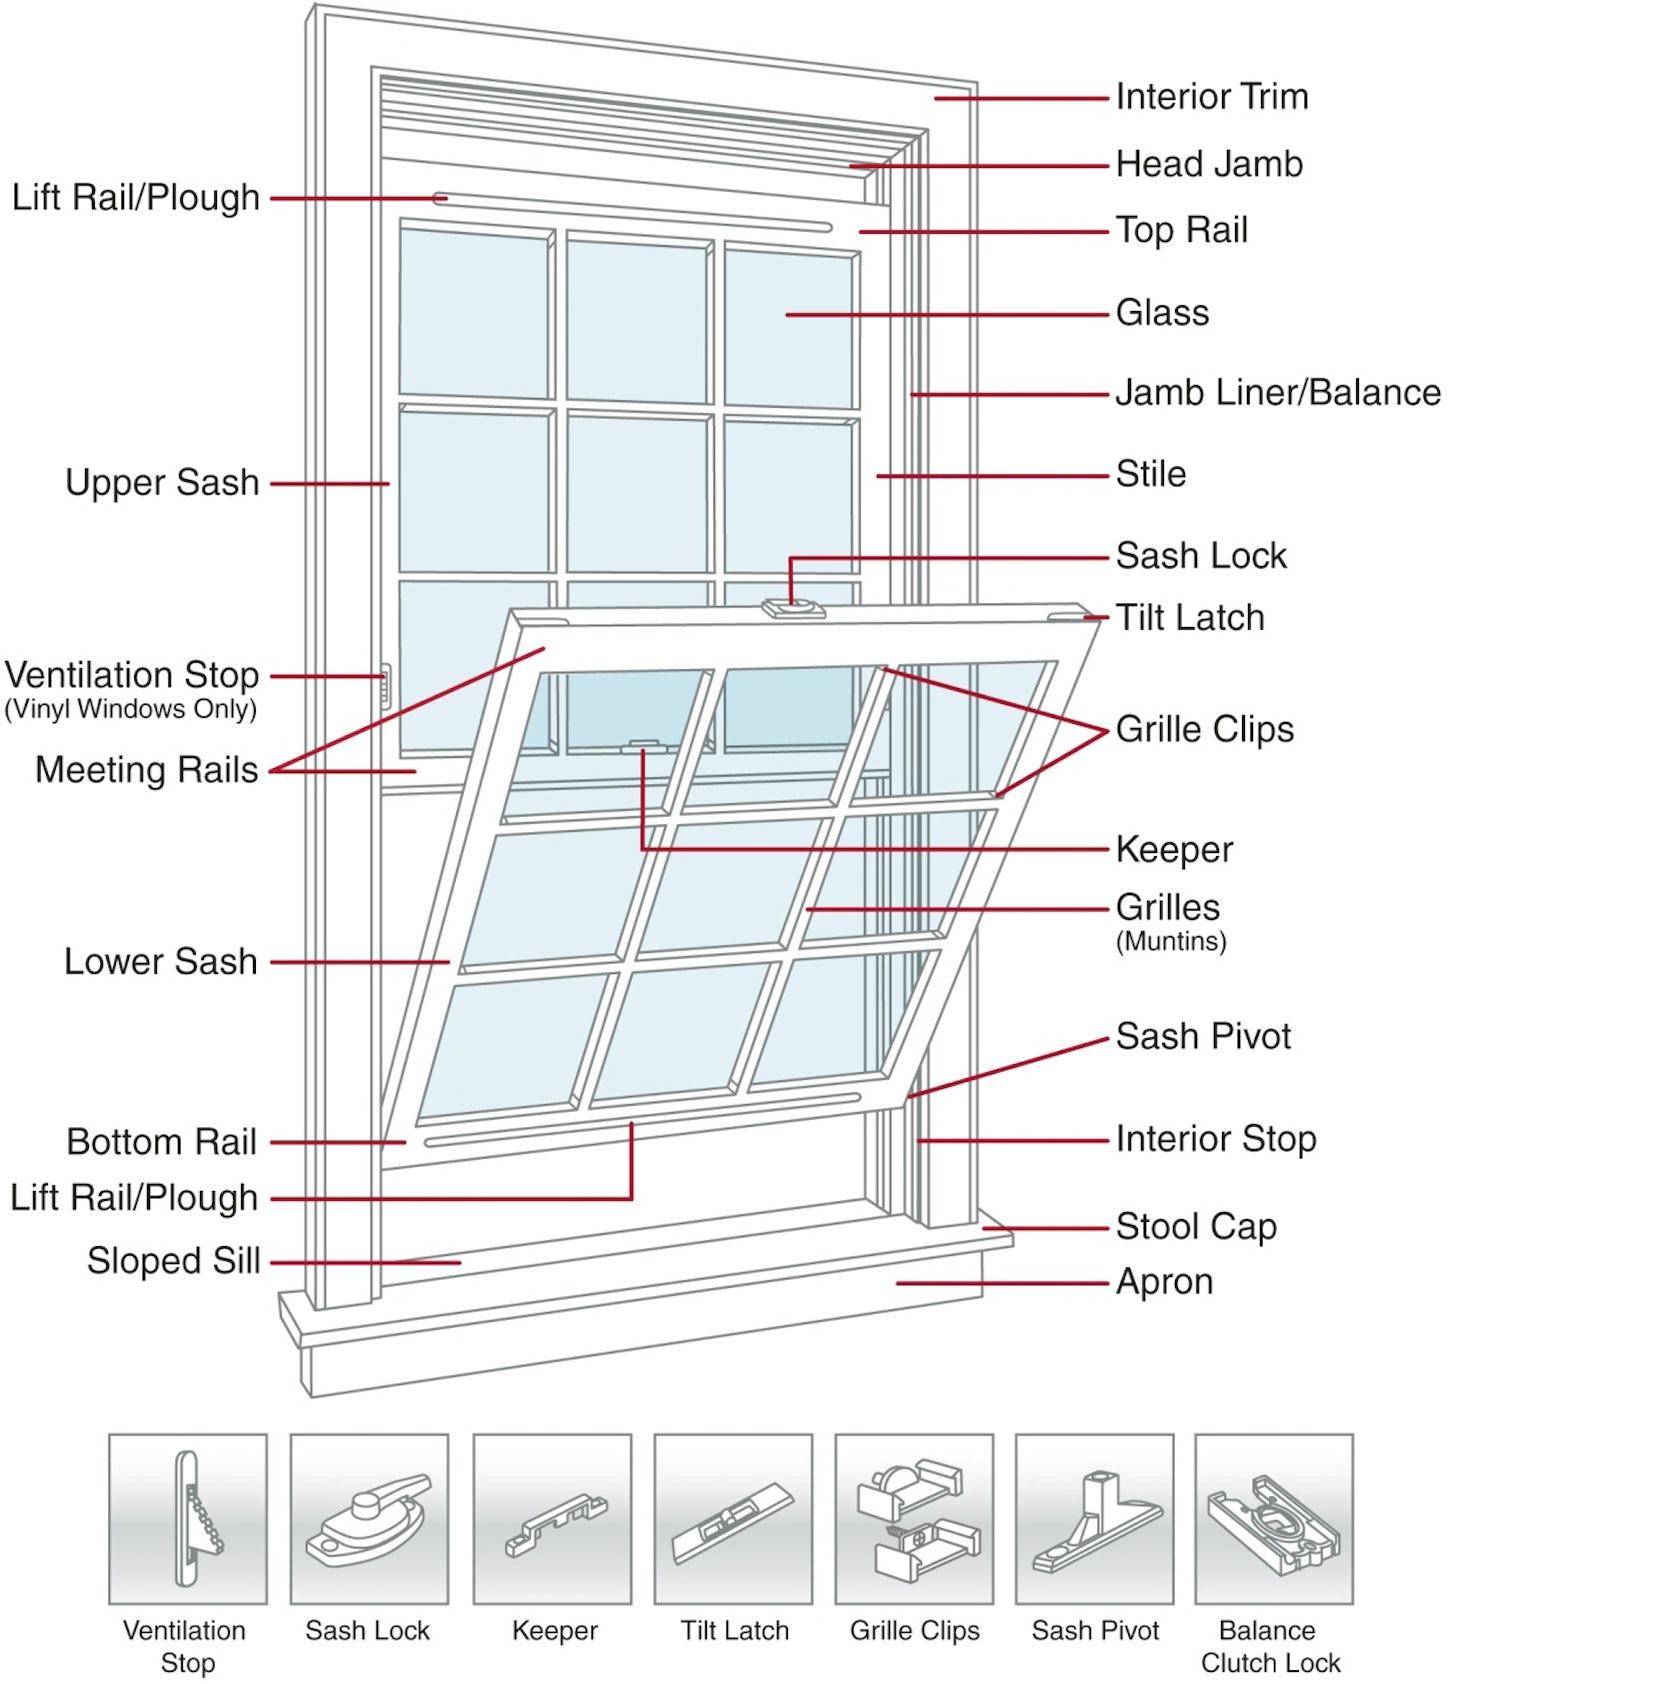 View topic bathroom windows exposed best solution for privacy - View Topic Bathroom Windows Exposed Best Solution For Privacy 51